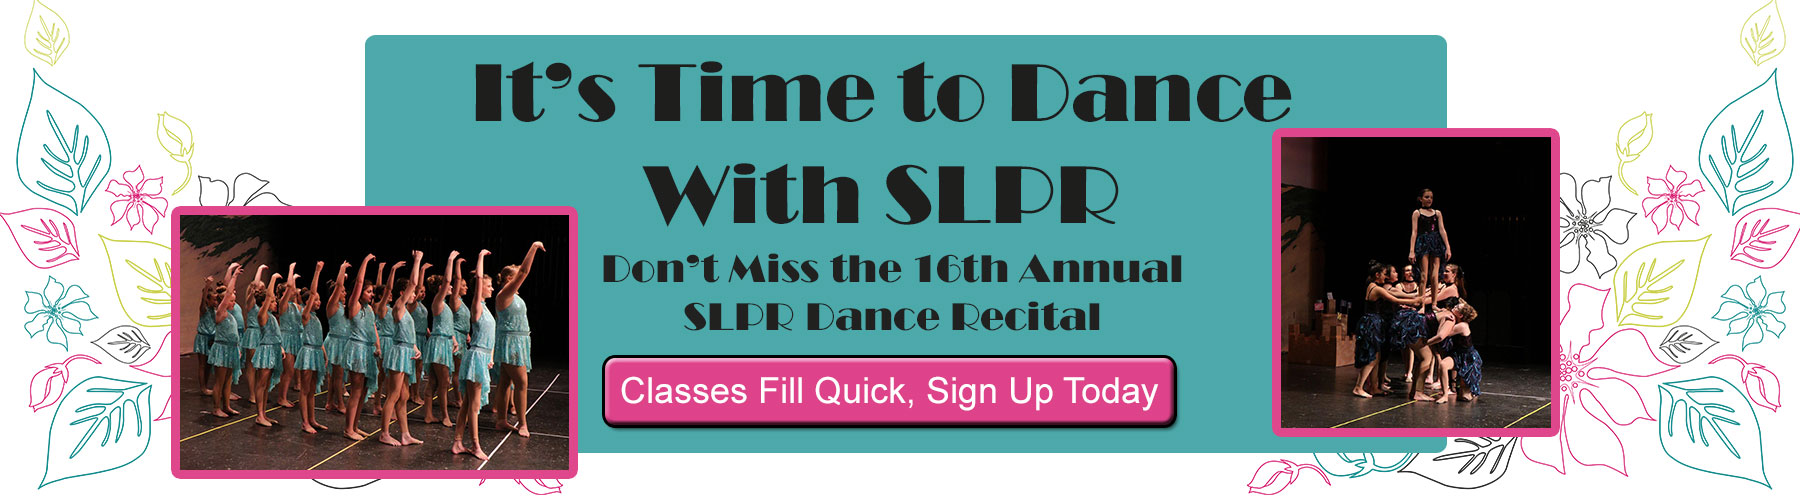 SLPR Dance Programs